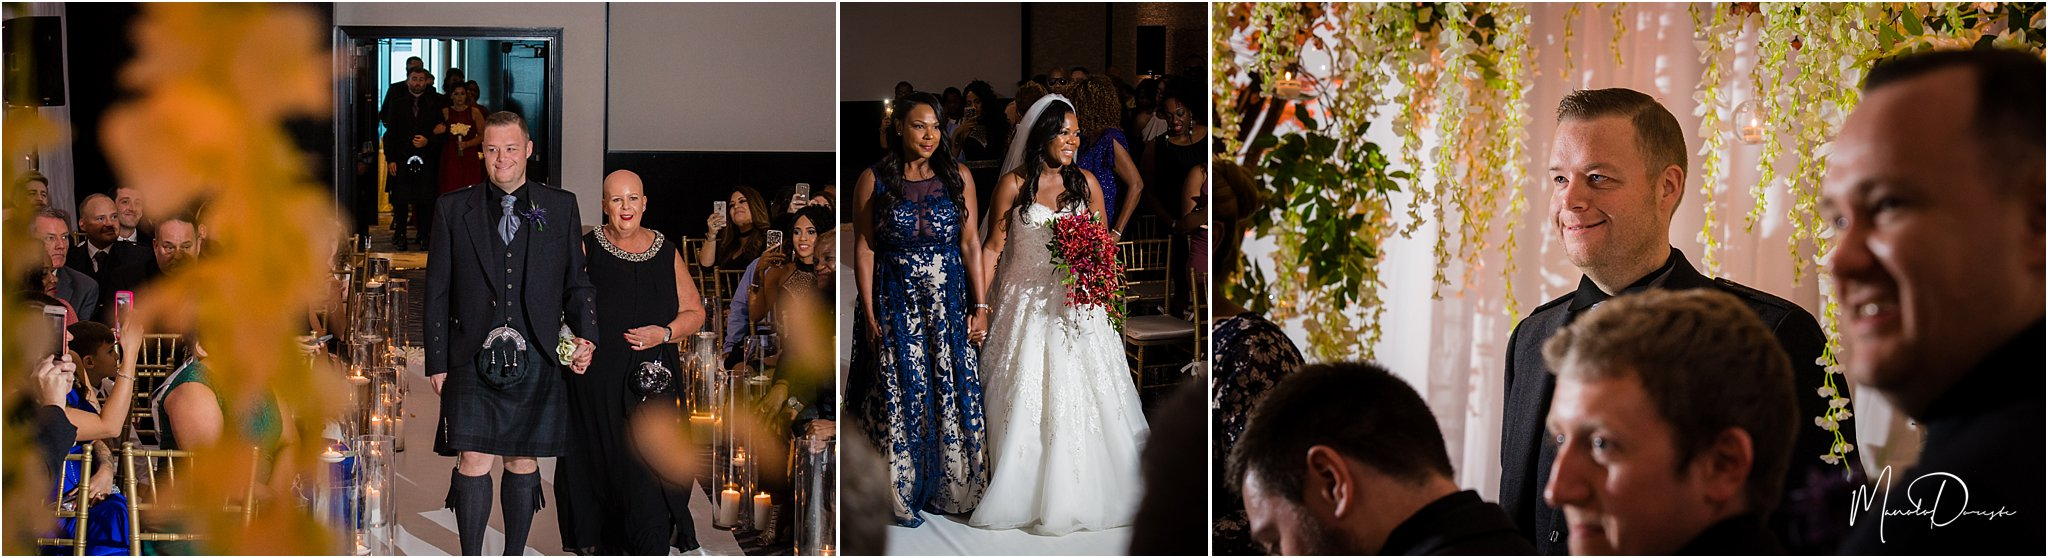 0118_ManoloDoreste_InFocusStudios_Wedding_Family_Photography_Miami_MiamiPhotographer.jpg